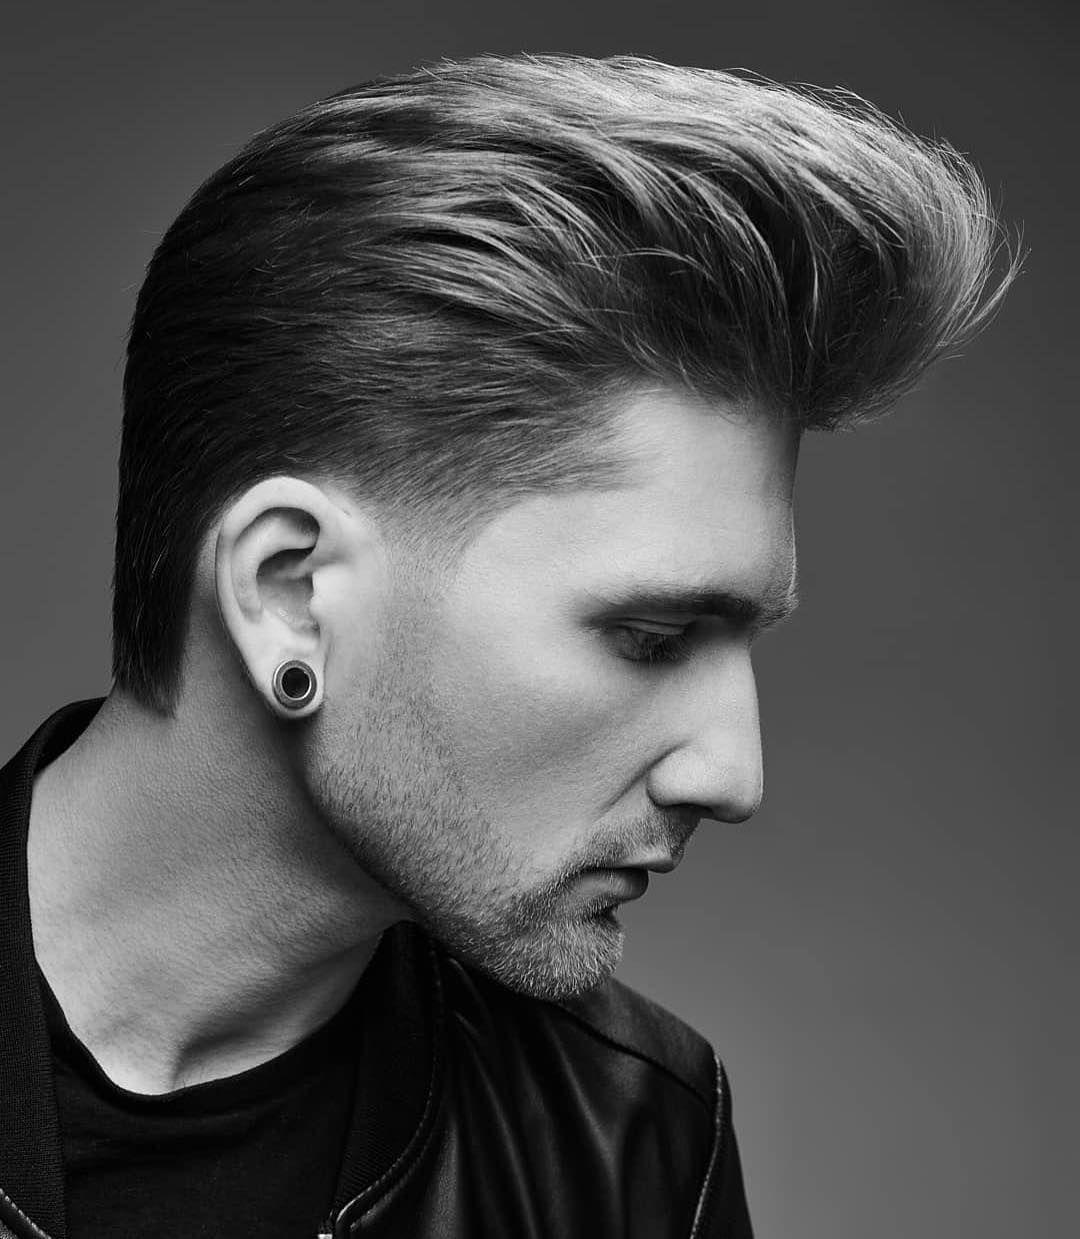 Mens Hairstyles 2018 Ukmasterbarbers Instagram Fotos Und